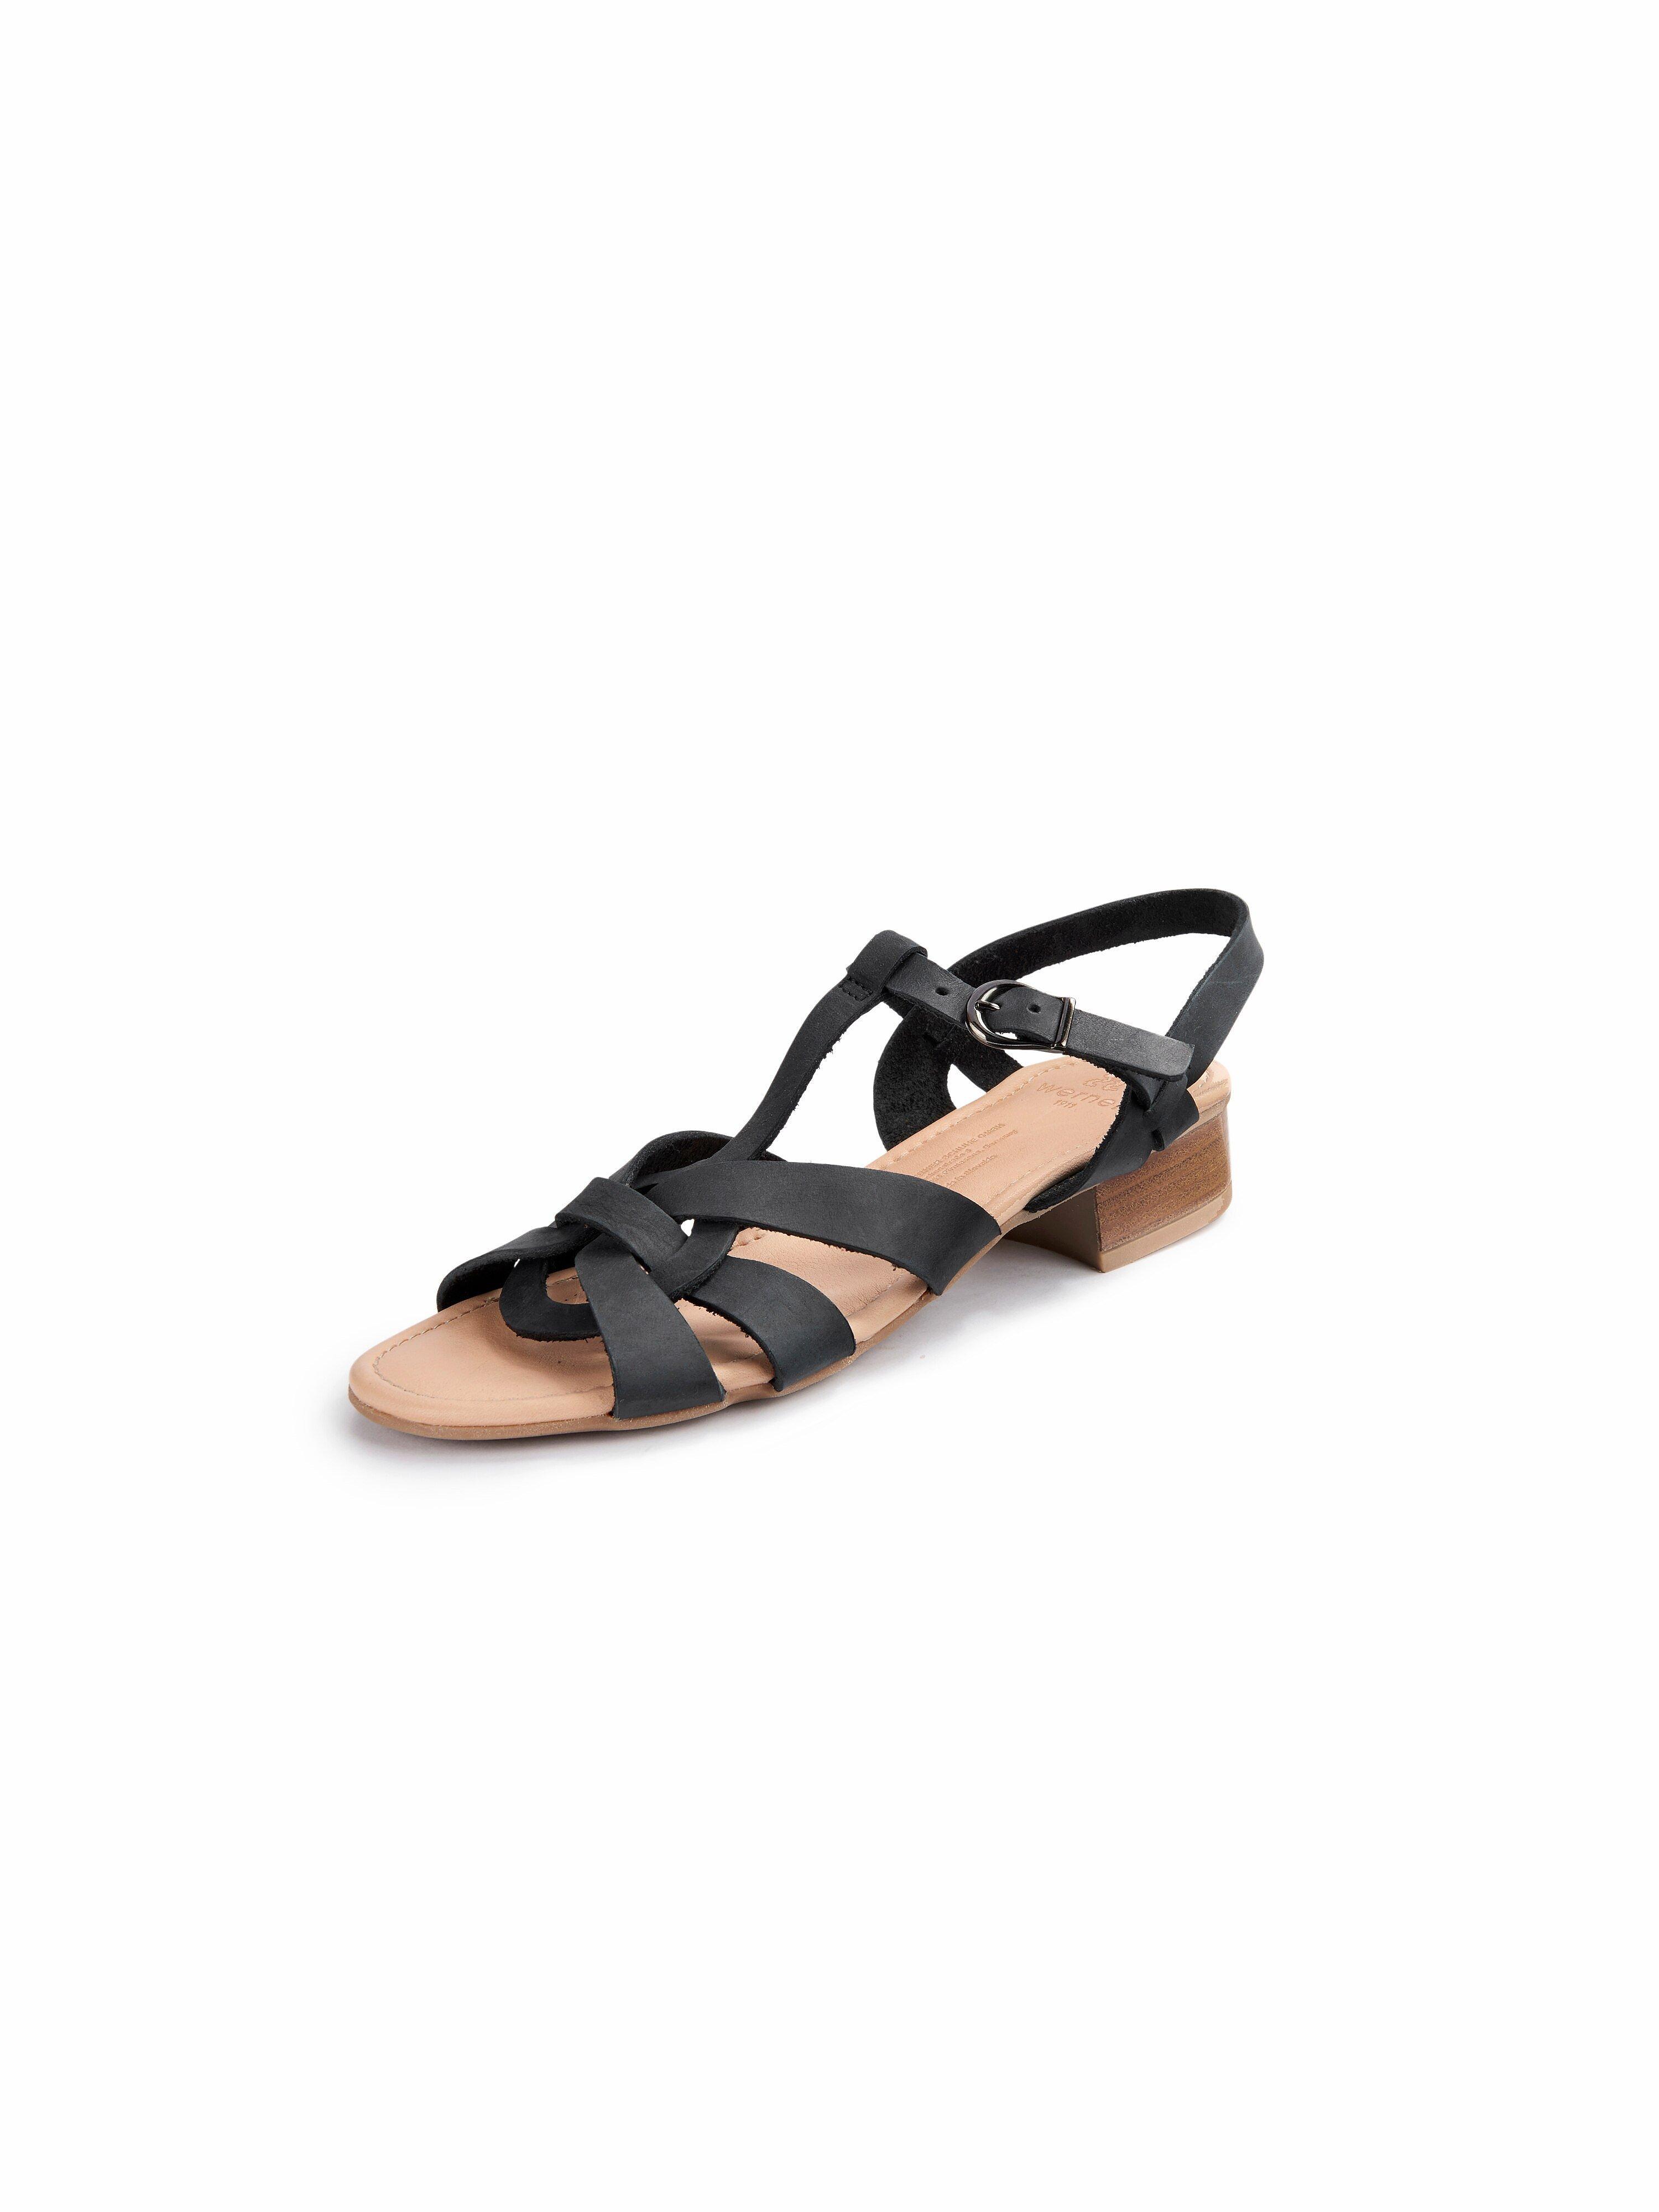 Les sandales  Werner Schuhe noir taille 41